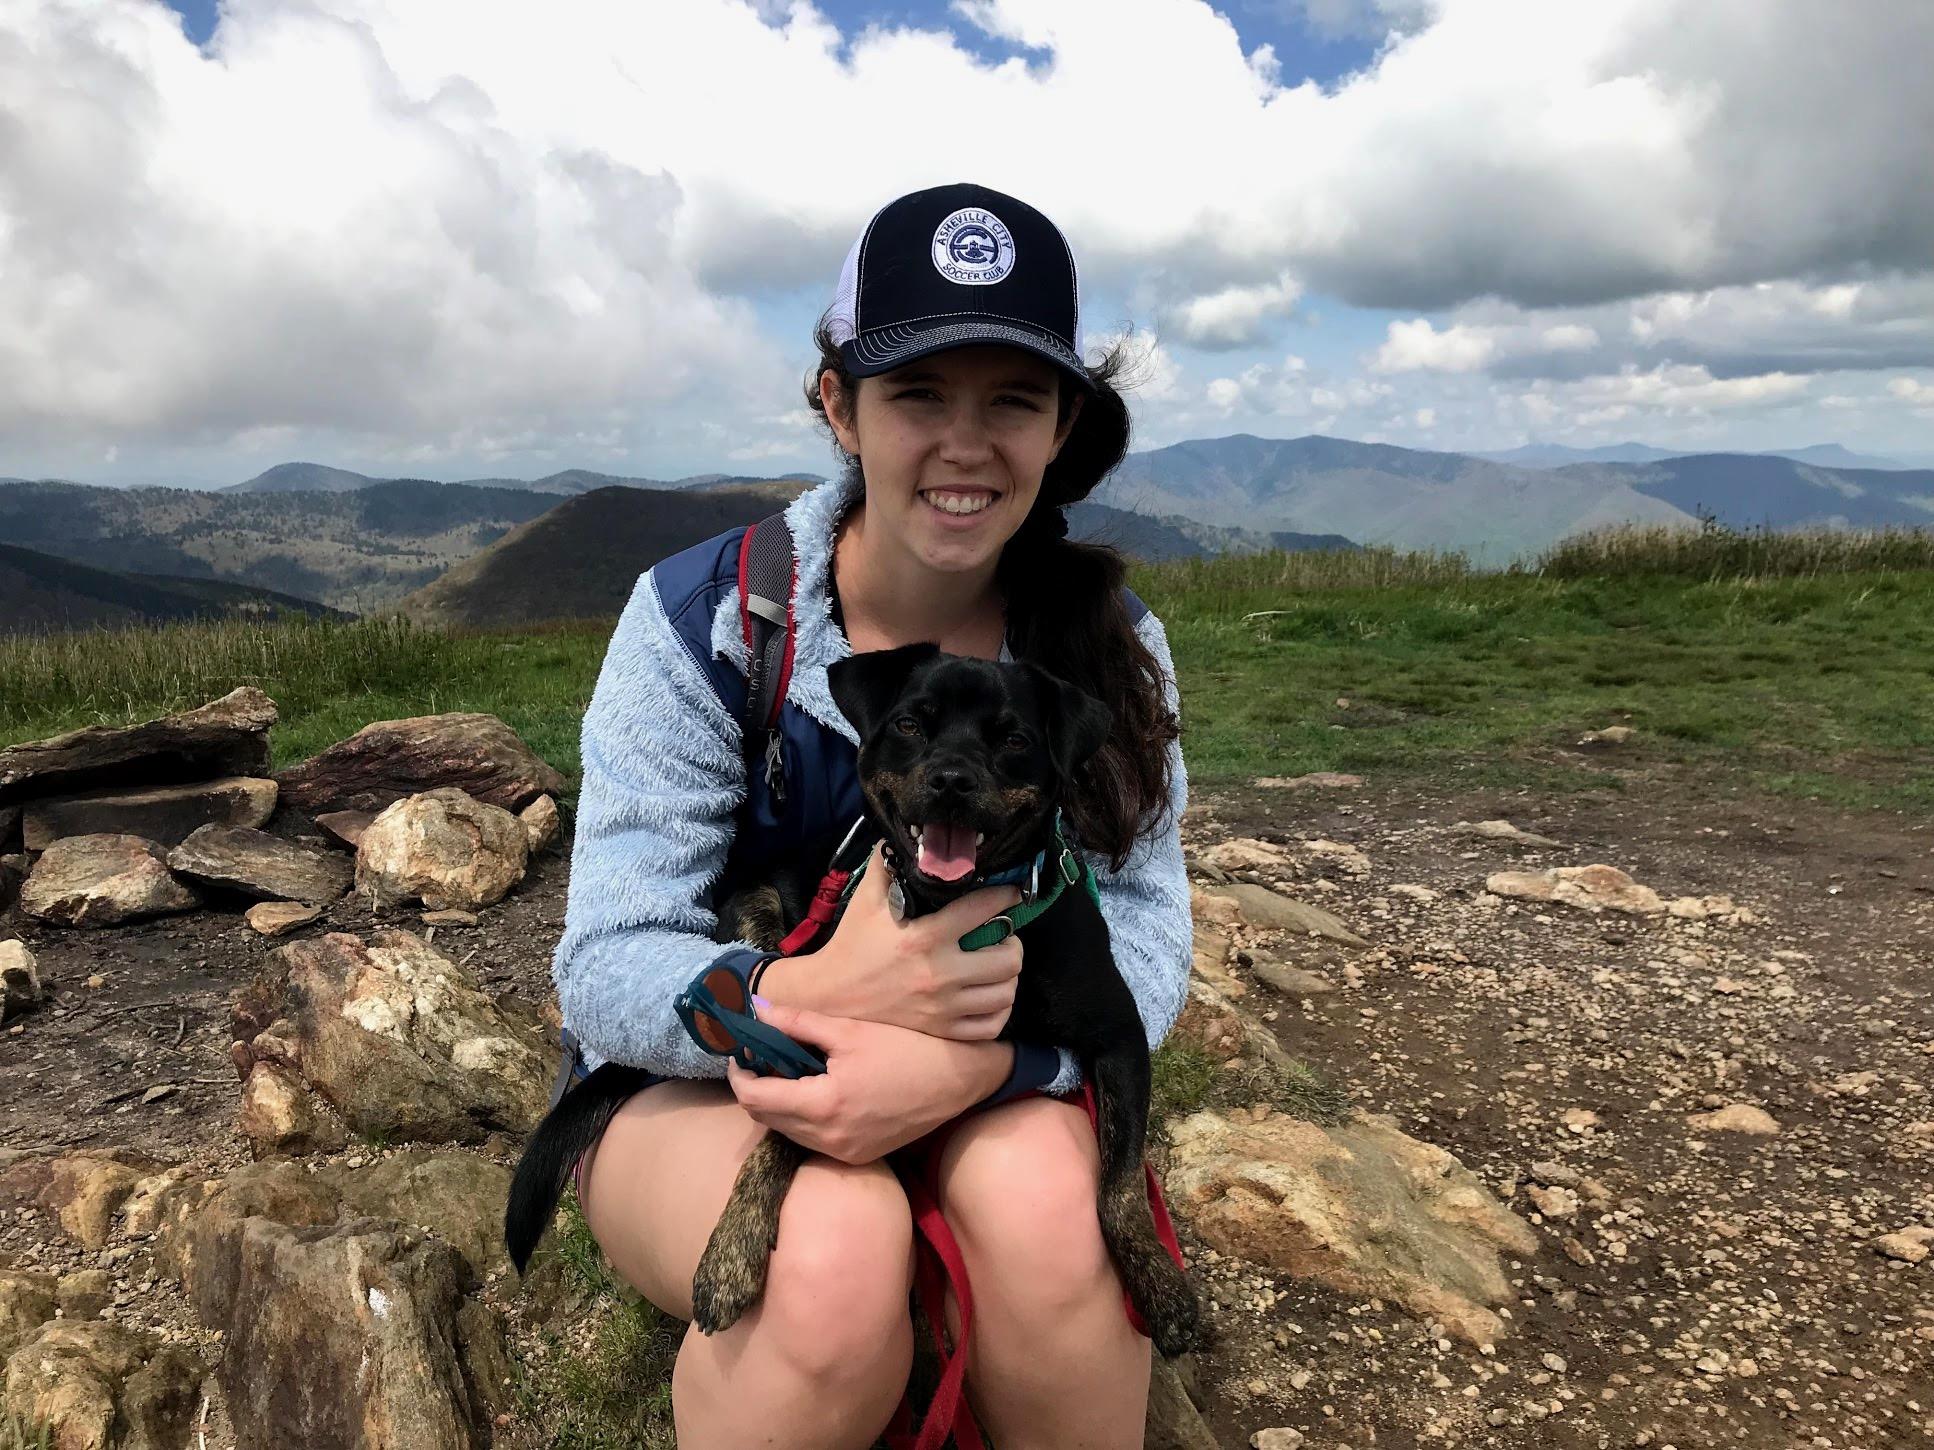 woman-intern-with-dog